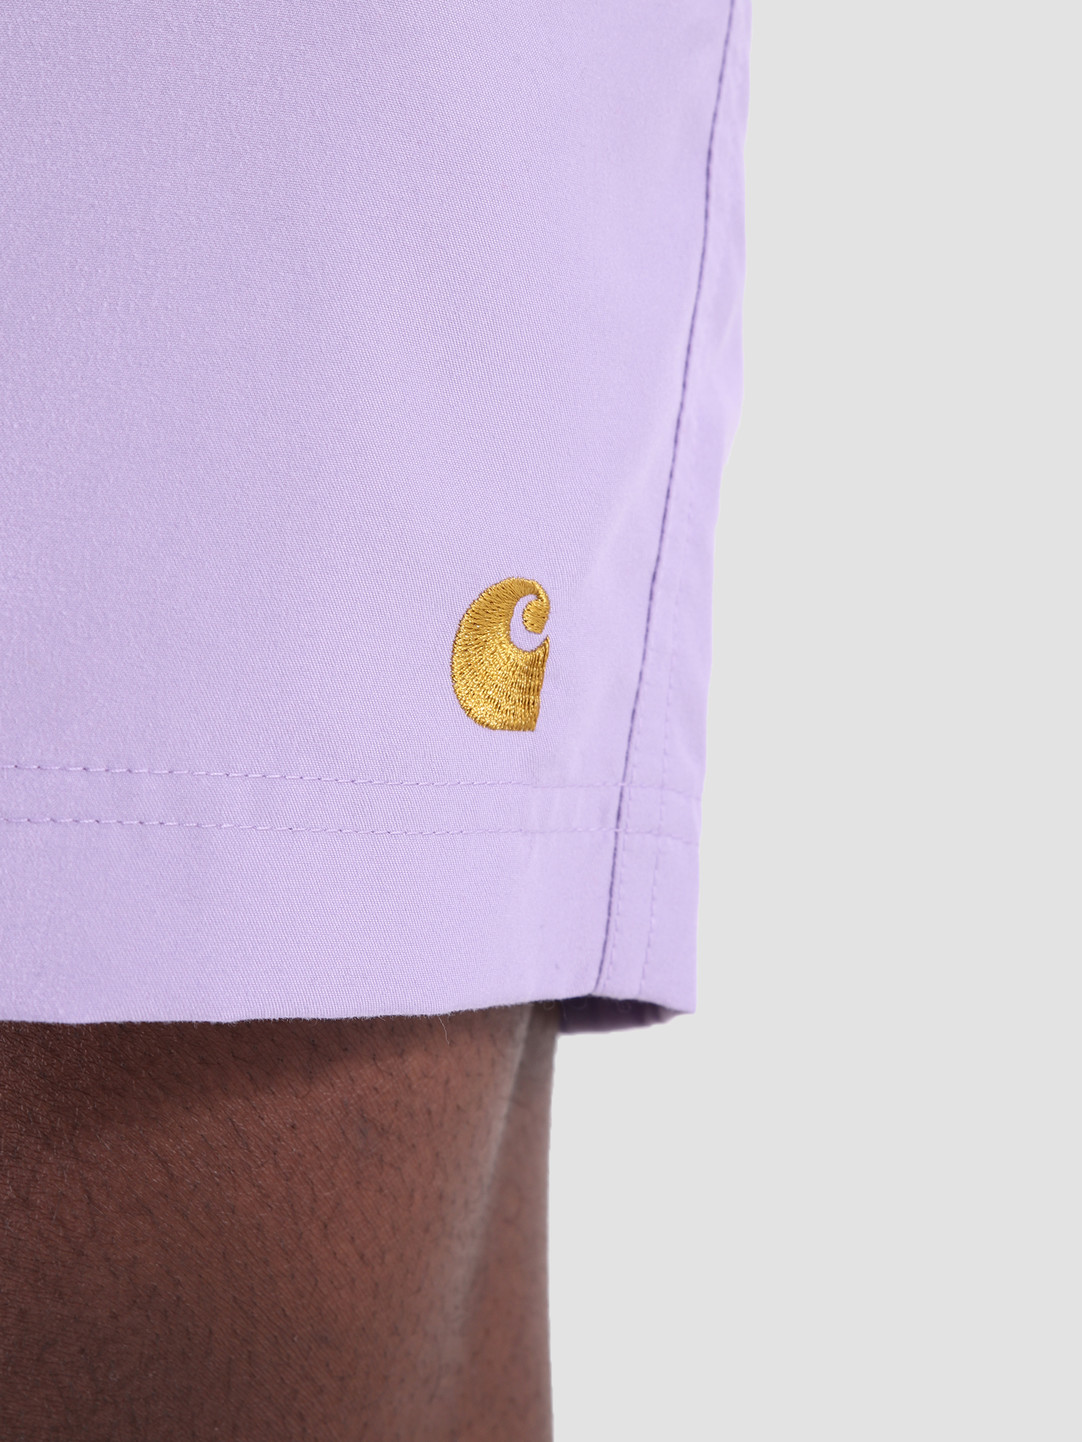 Carhartt WIP Carhartt WIP Chase Swim Trunk Soft Lavender Gold 62046390